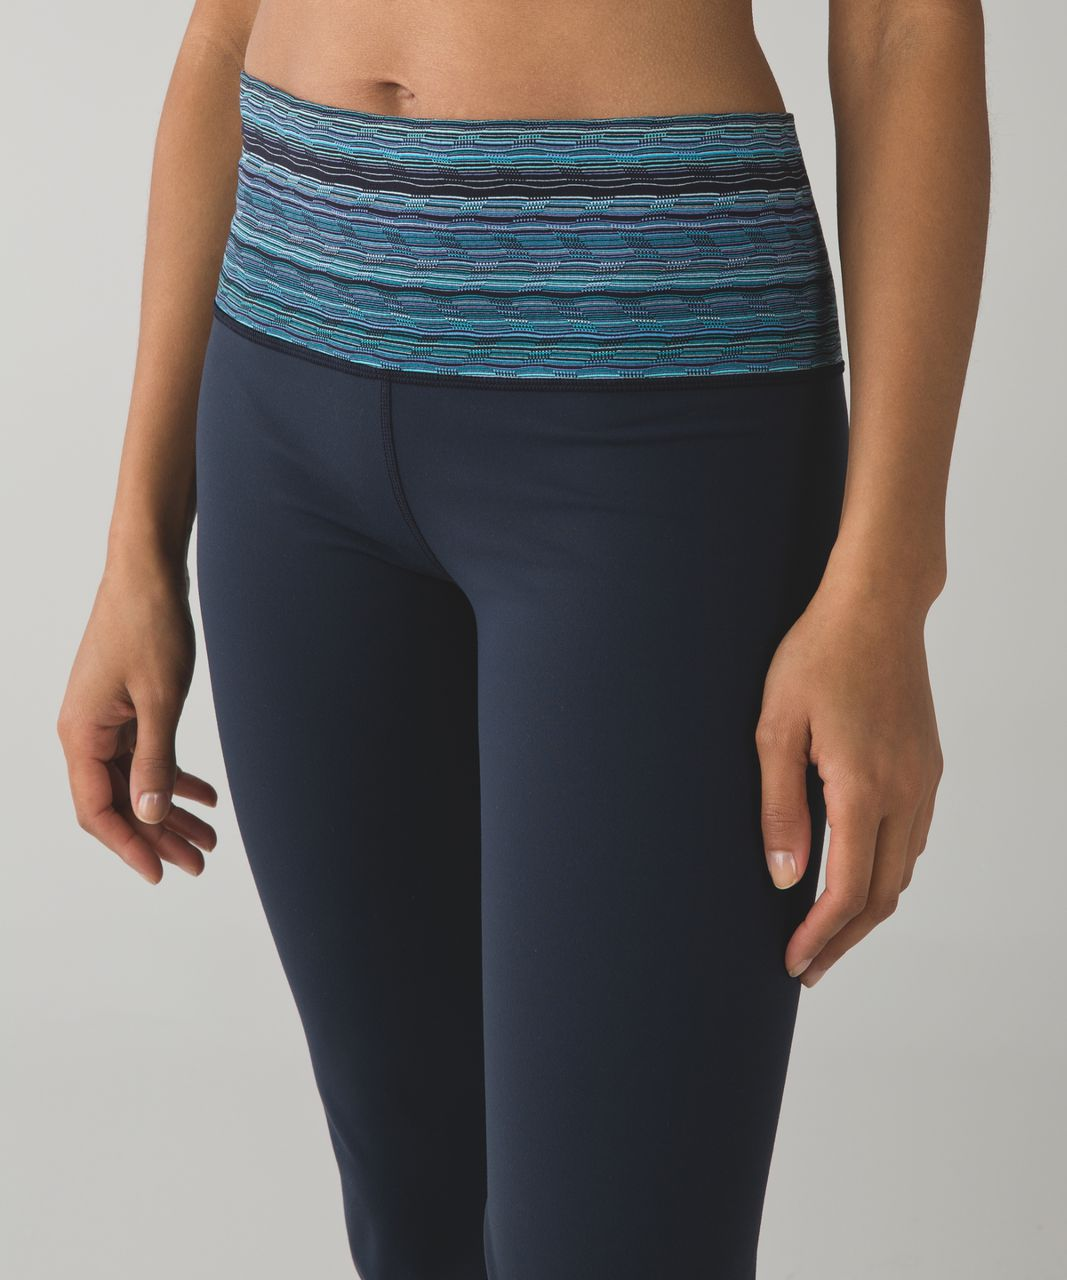 Lululemon Groove Pant III (Tall) - Inkwell / Space Dye Twist Naval Blue Peacock Blue